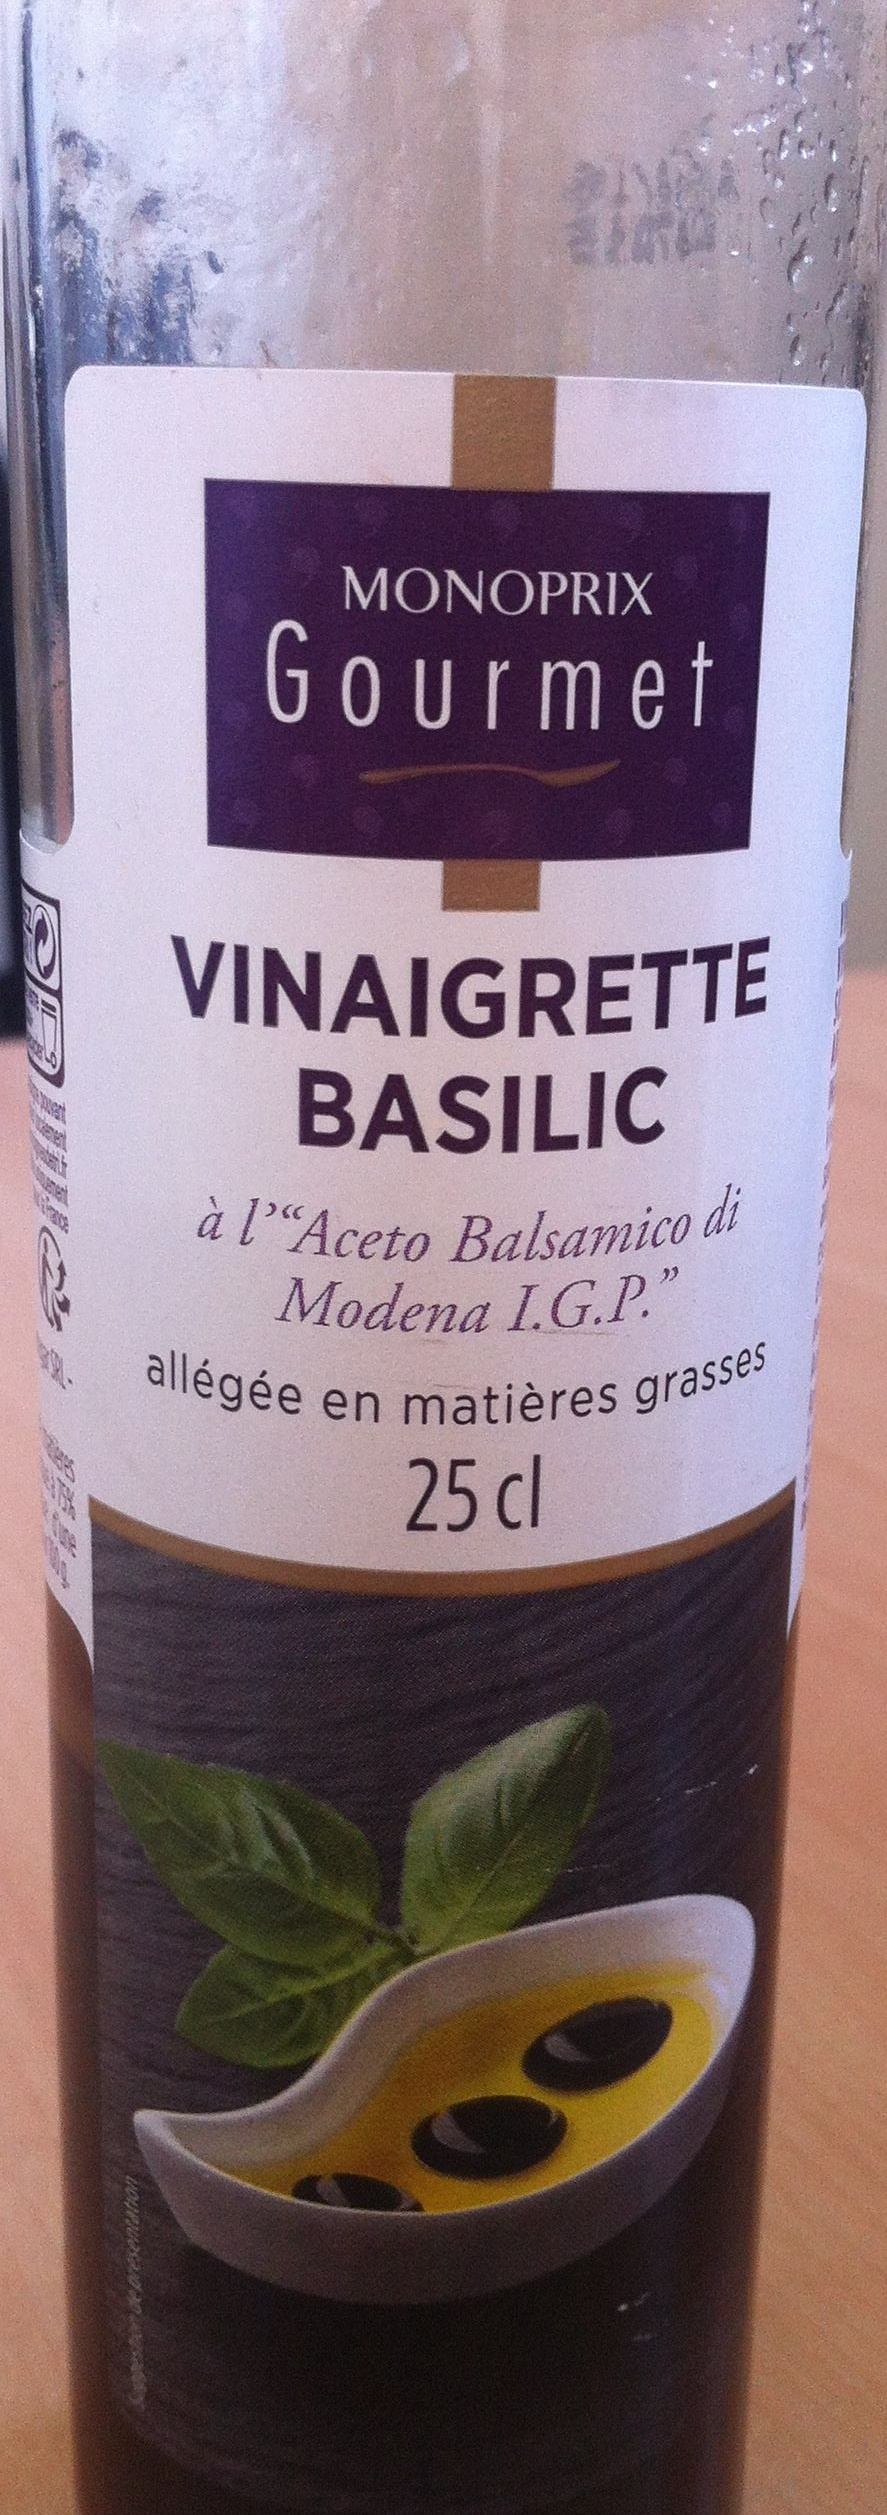 Vinaigrette basilic - Product - fr